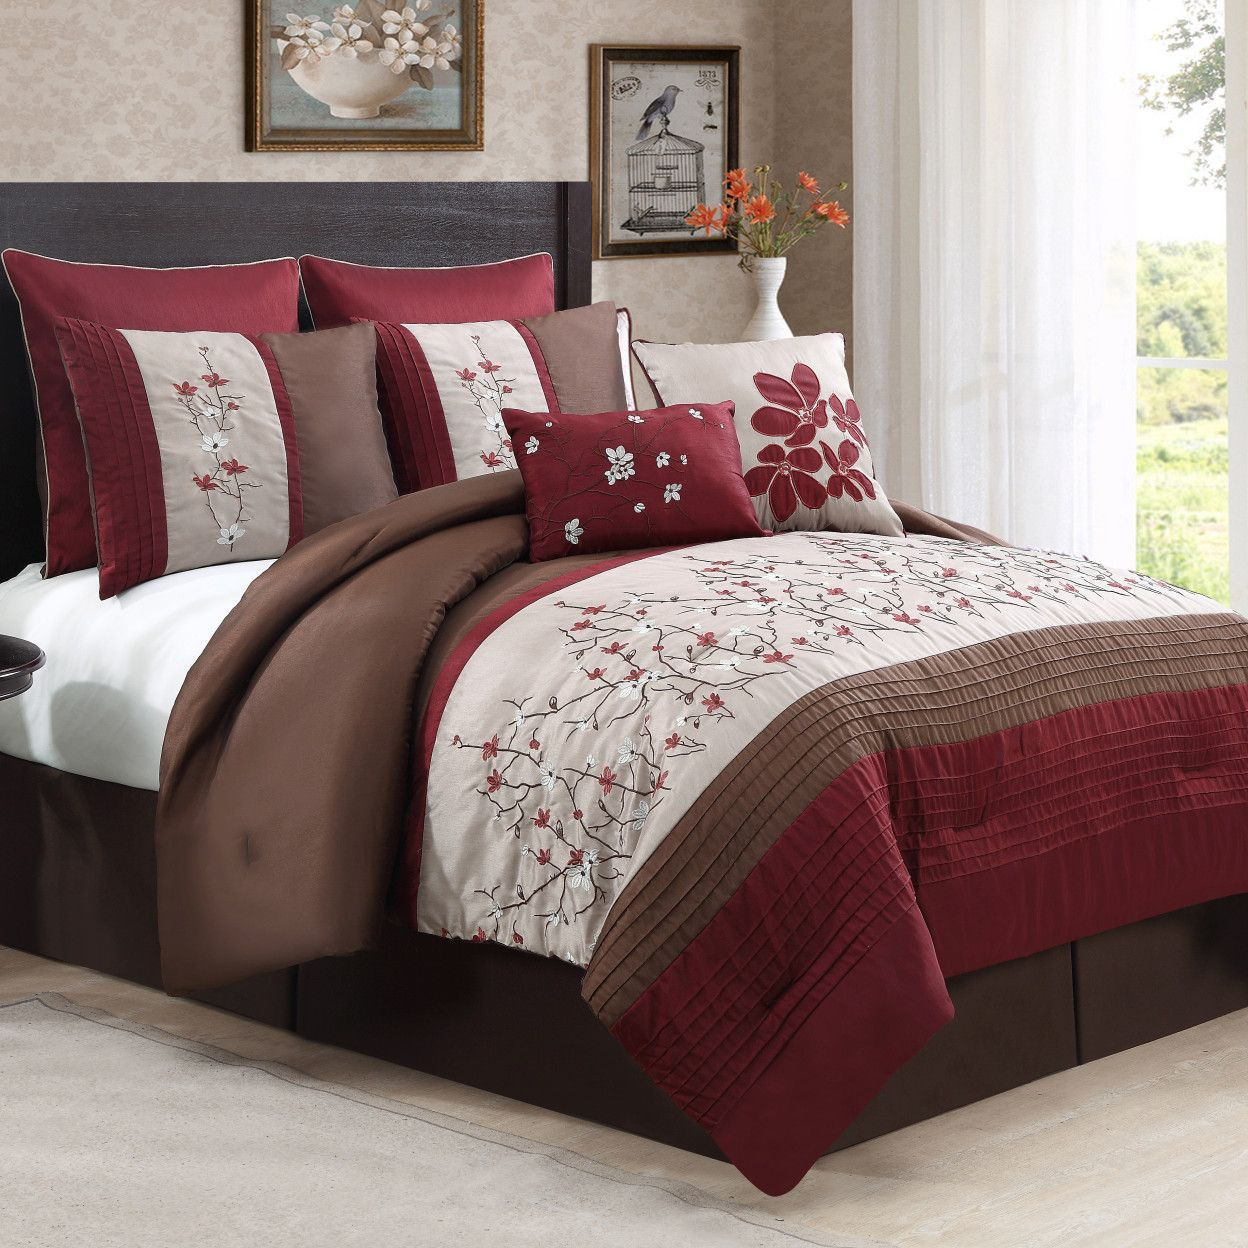 Sakura 8 Piece Comforter Set